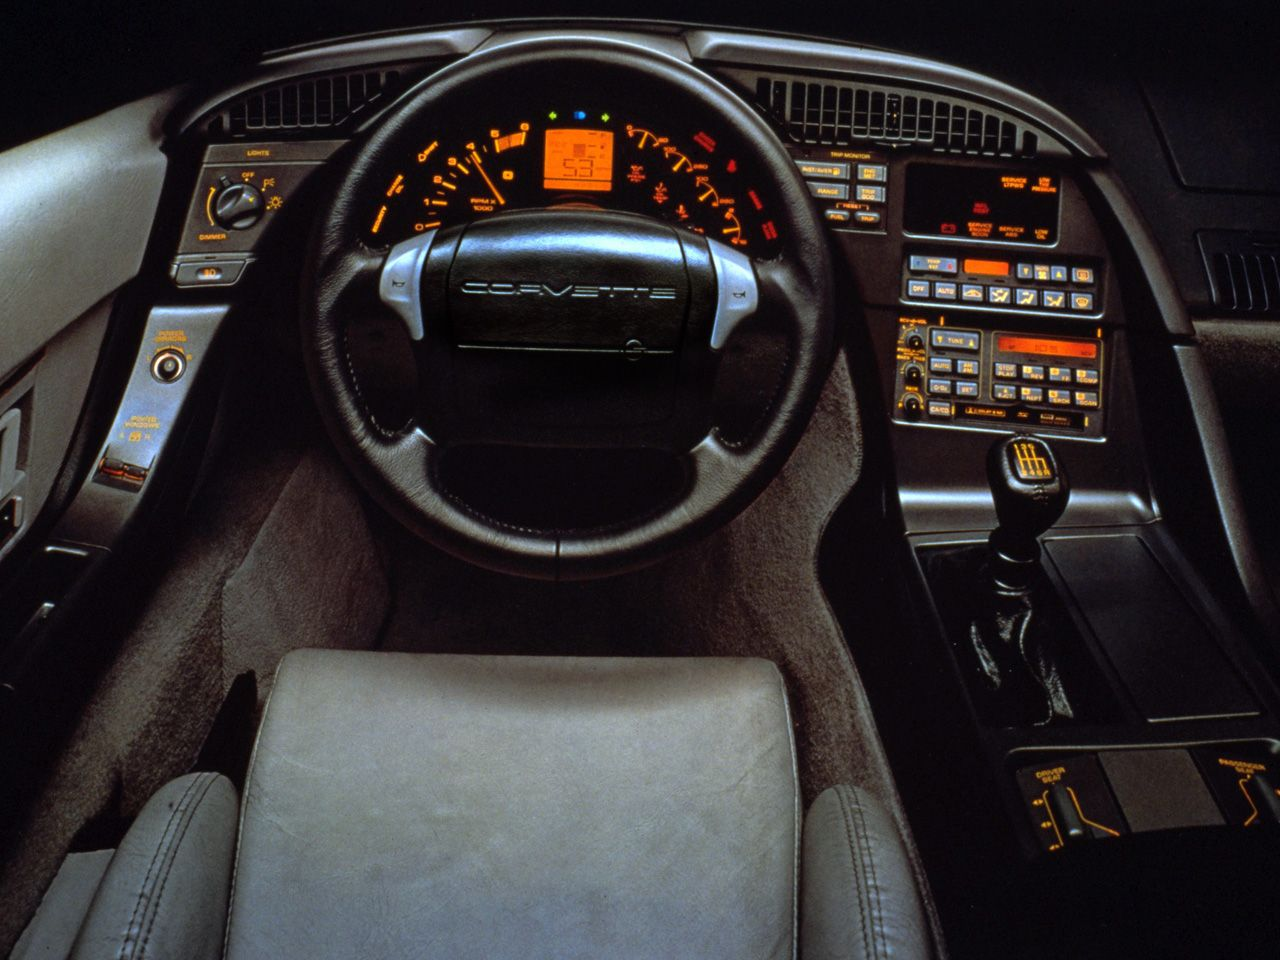 1995 corvette interior chevrolet corvette c4 manual transmission super sport buick cadillac [ 1280 x 960 Pixel ]